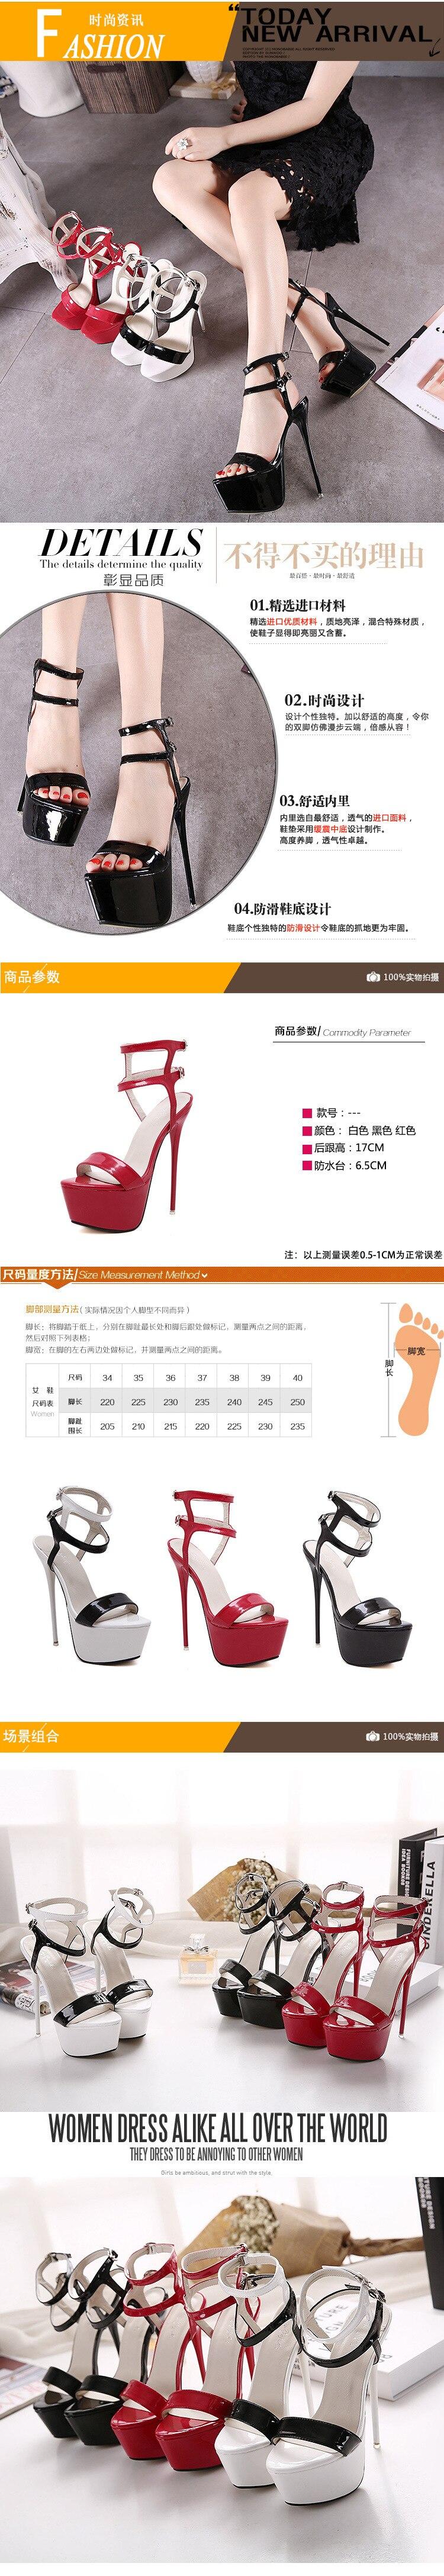 HTB1NY02L3HqK1RjSZFPq6AwapXa6 Women High Heels Sandals 16cm Sexy Stripper Shoes Party Pumps Shoes Women Gladiator Platform Sandals Size 35-46 CWF-my166-2